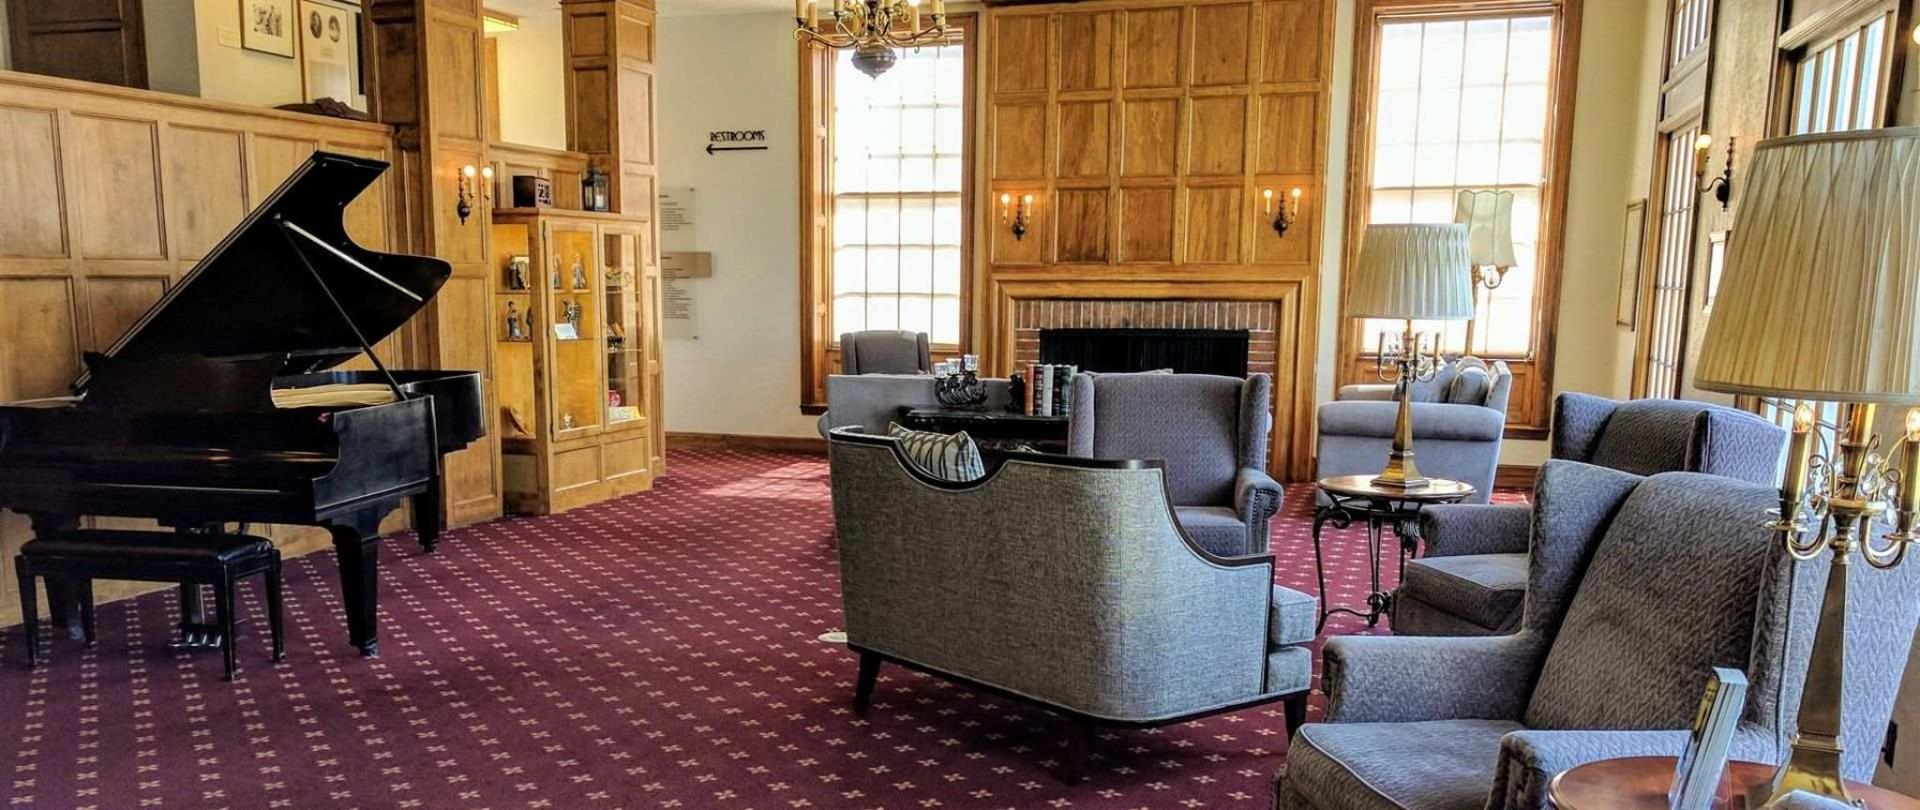 Lobby of Boulder Dam Hotel, 2018. Source: Boulder Dam Hotel.